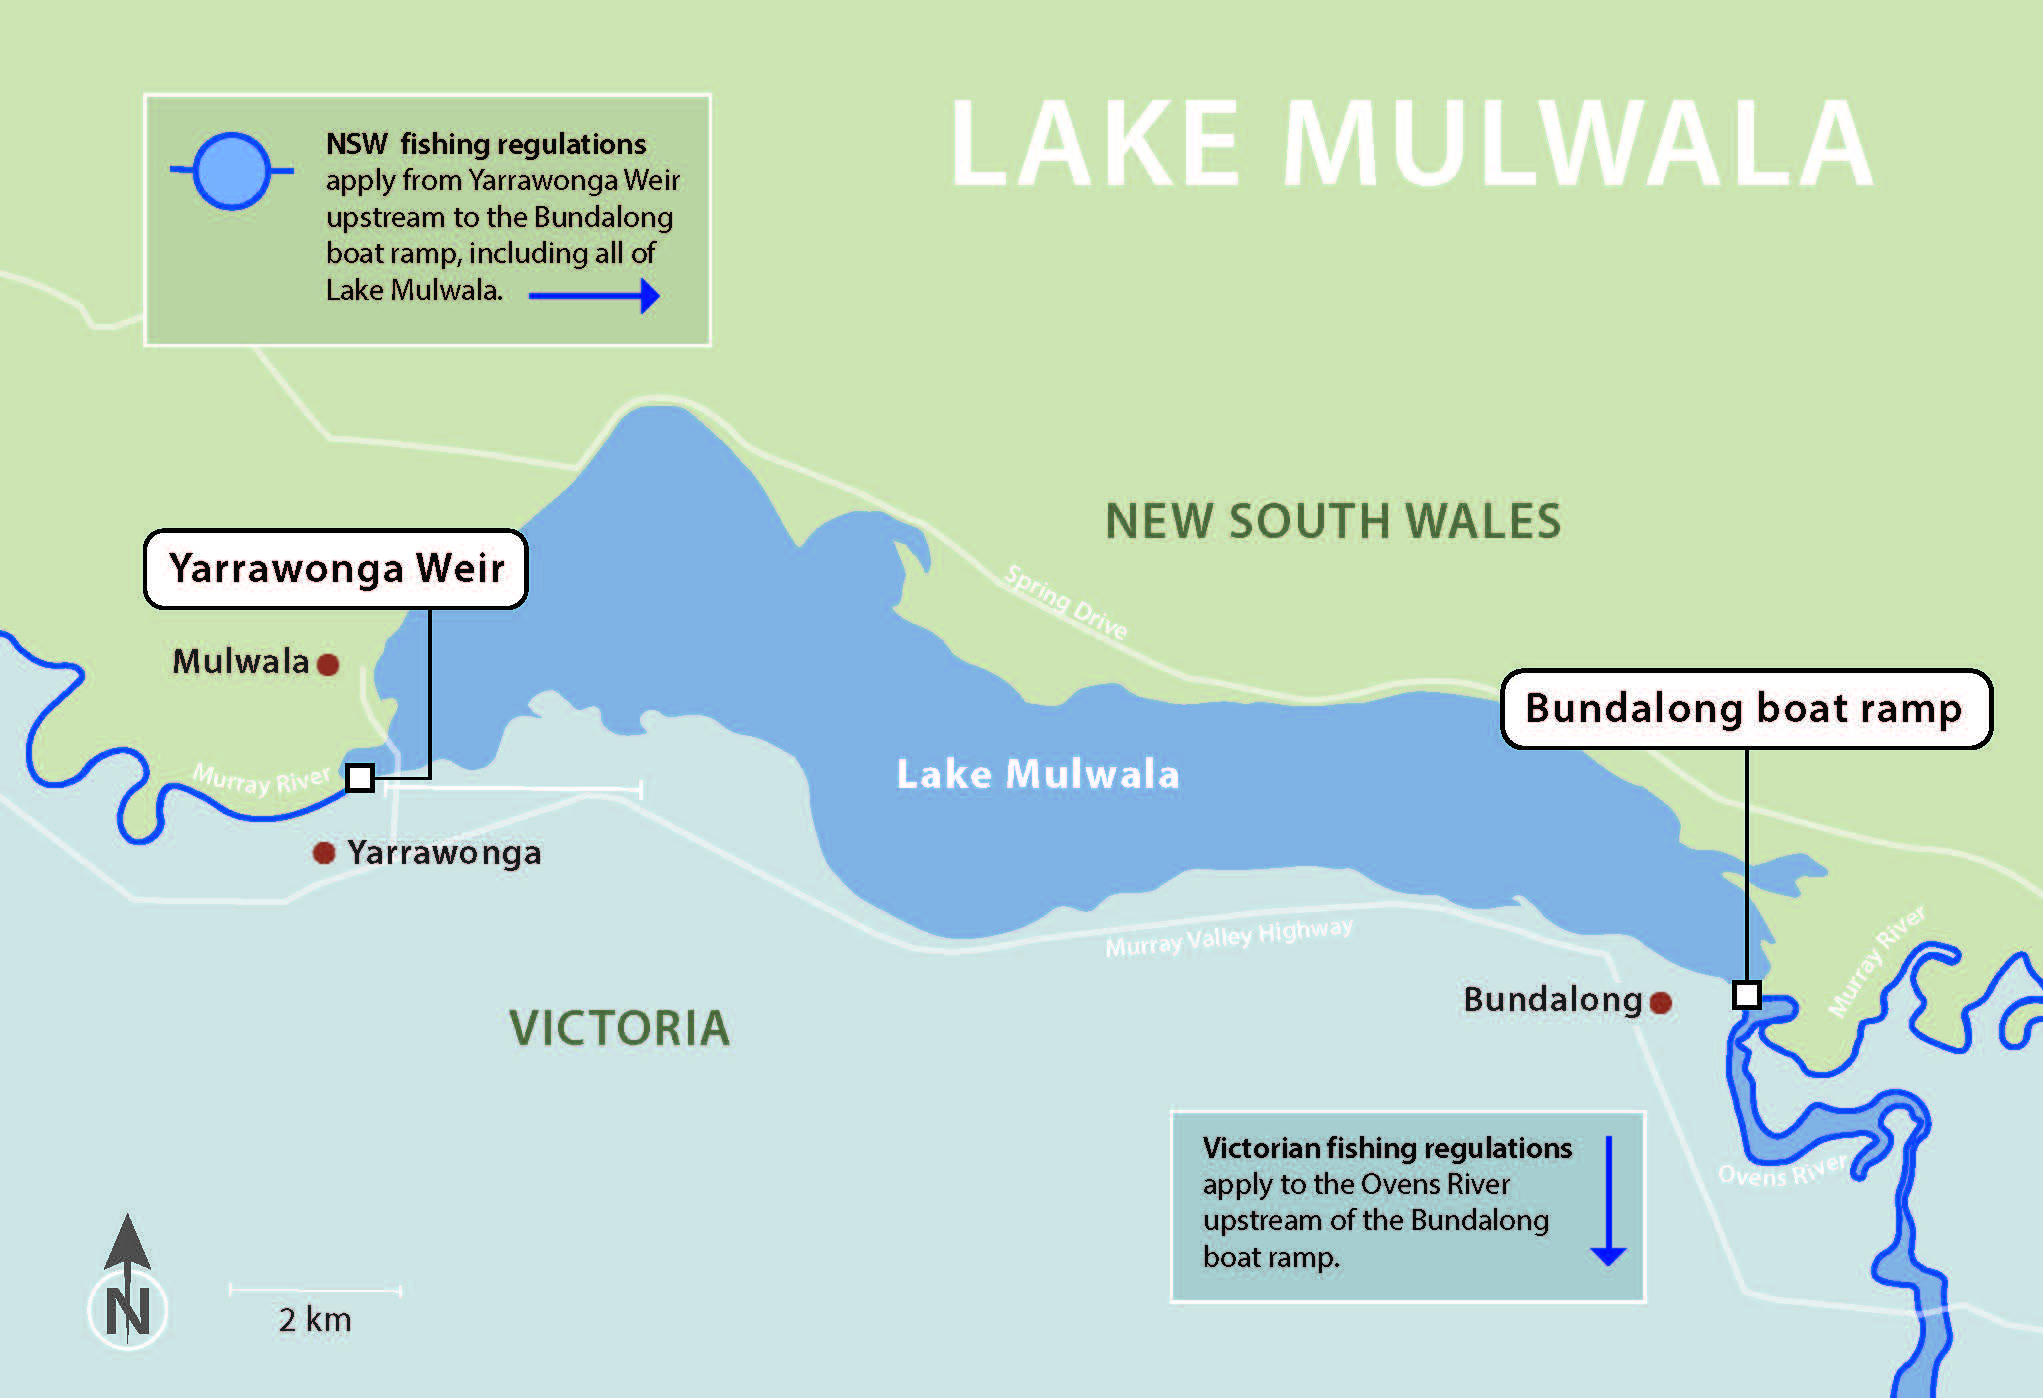 Map showing the location of Lake Mulwala